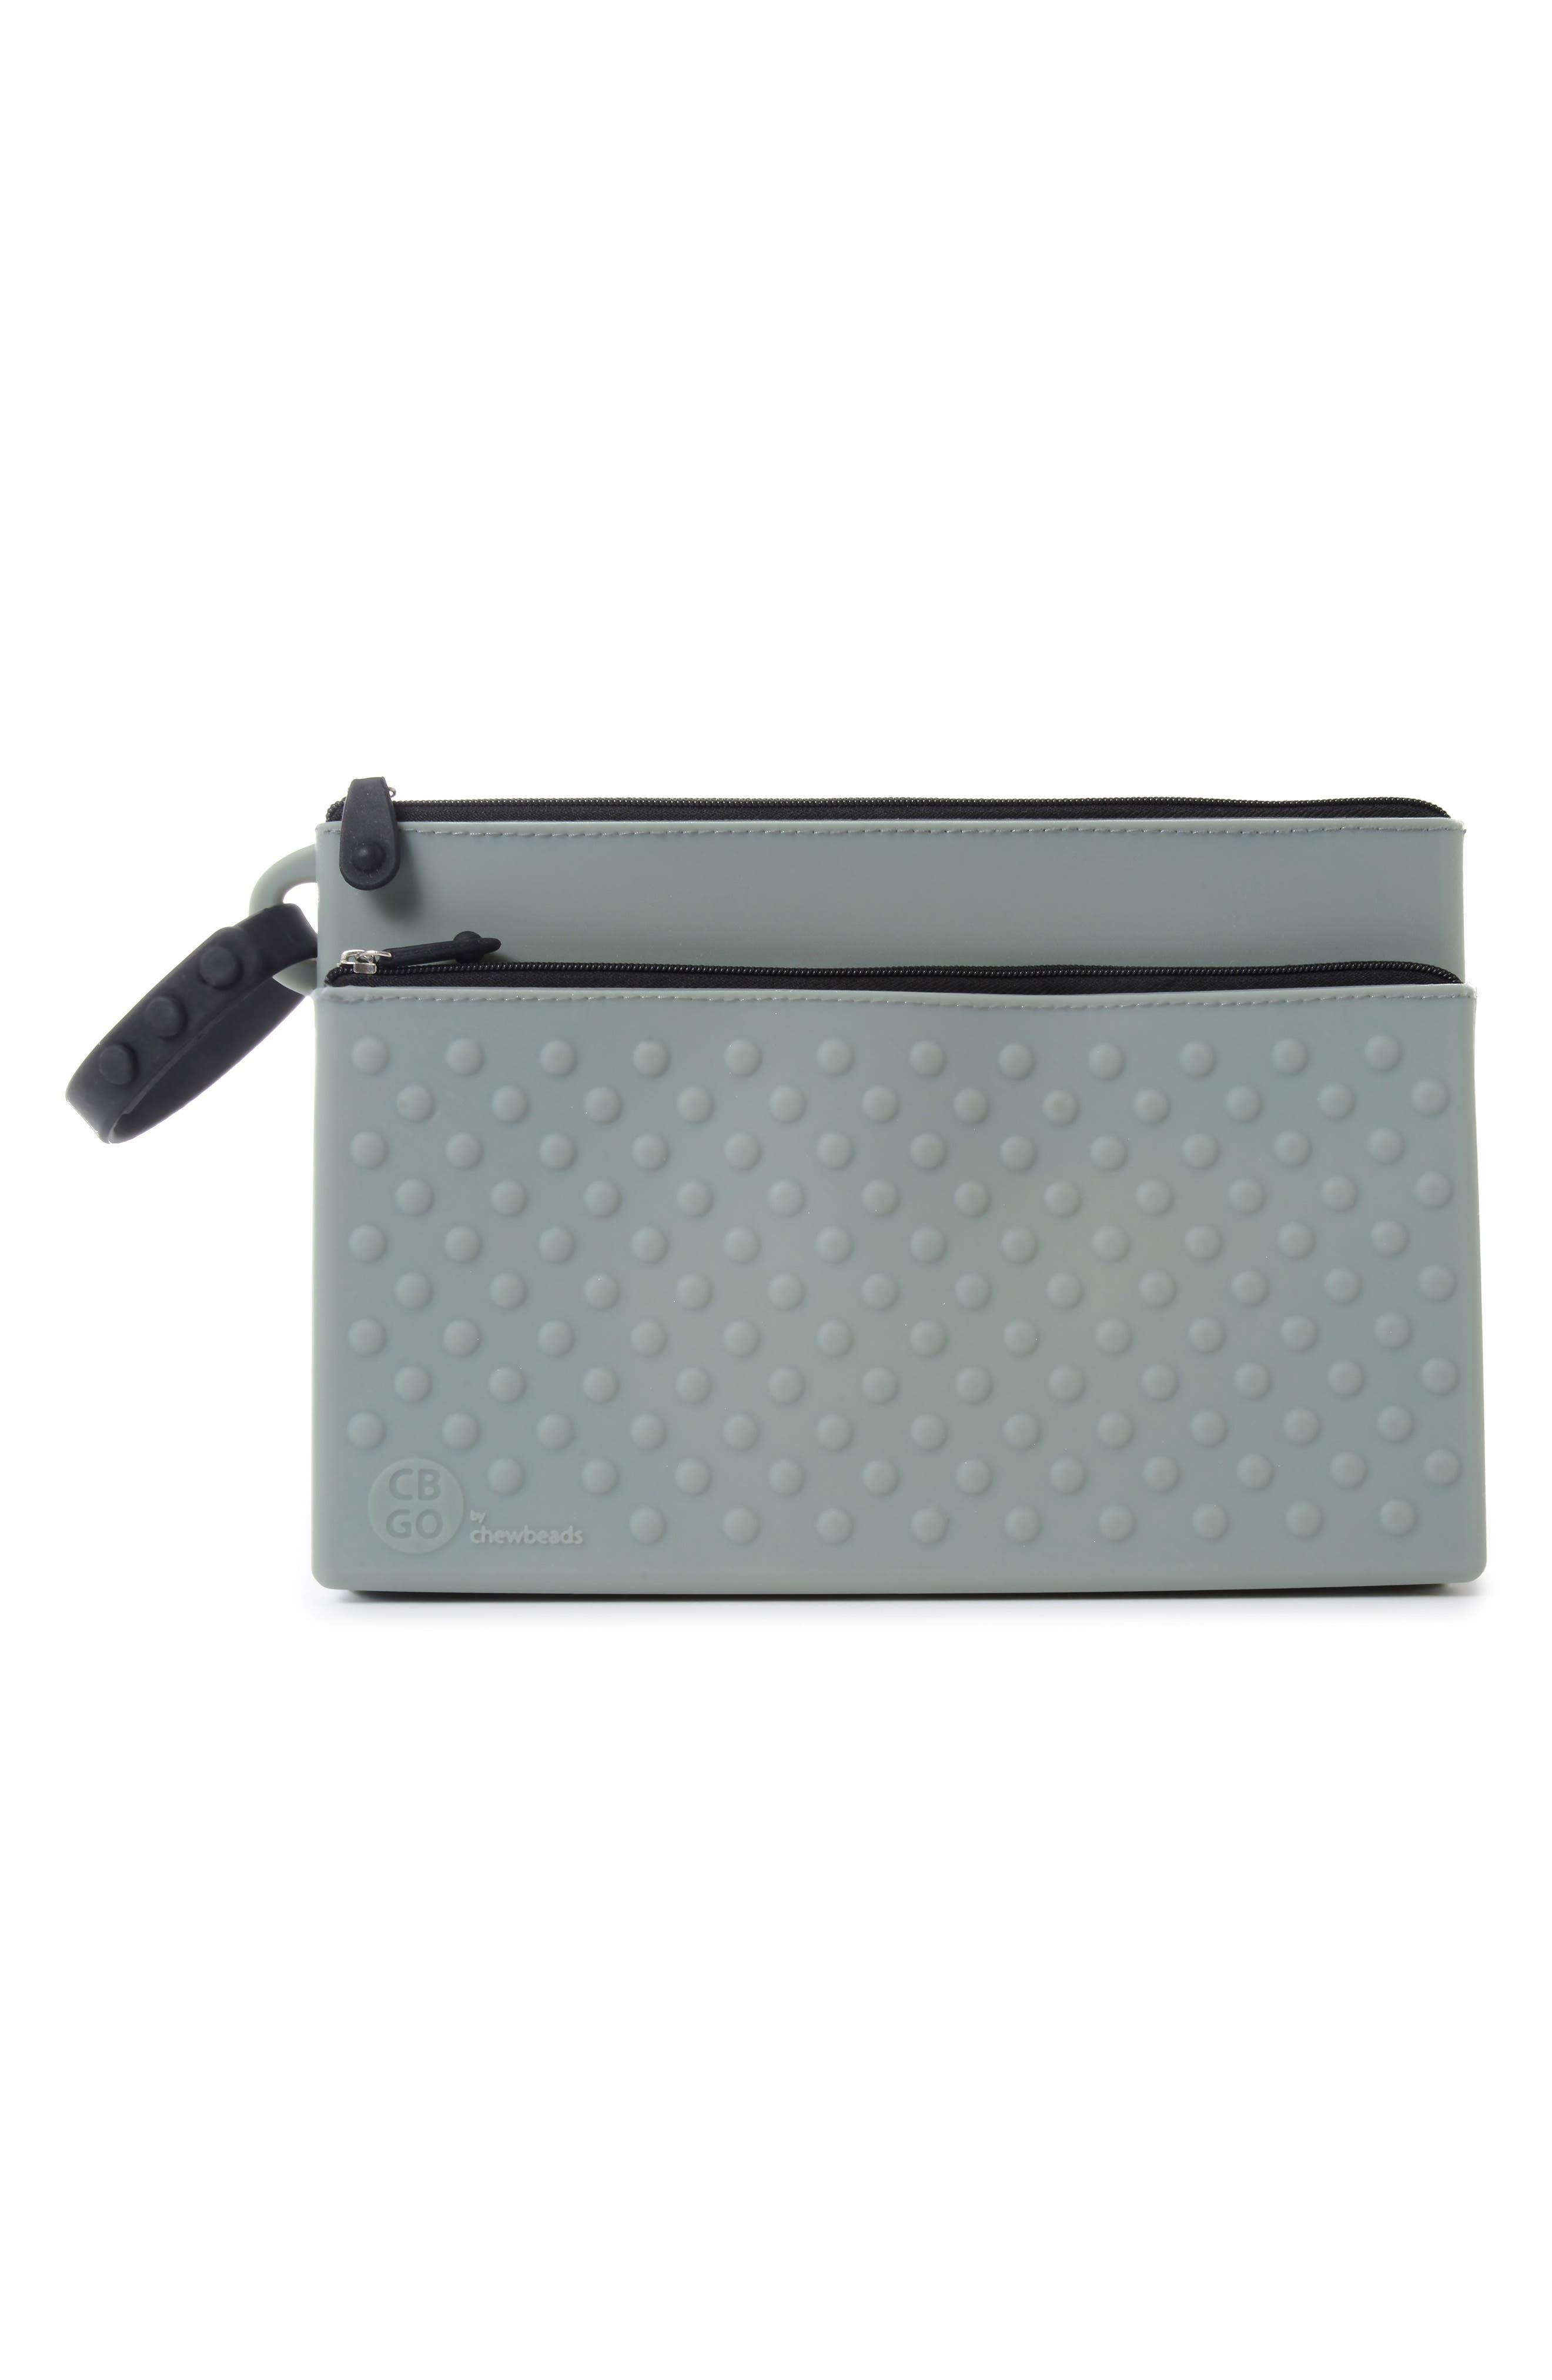 Silicone Wipes Case,                         Main,                         color, 020